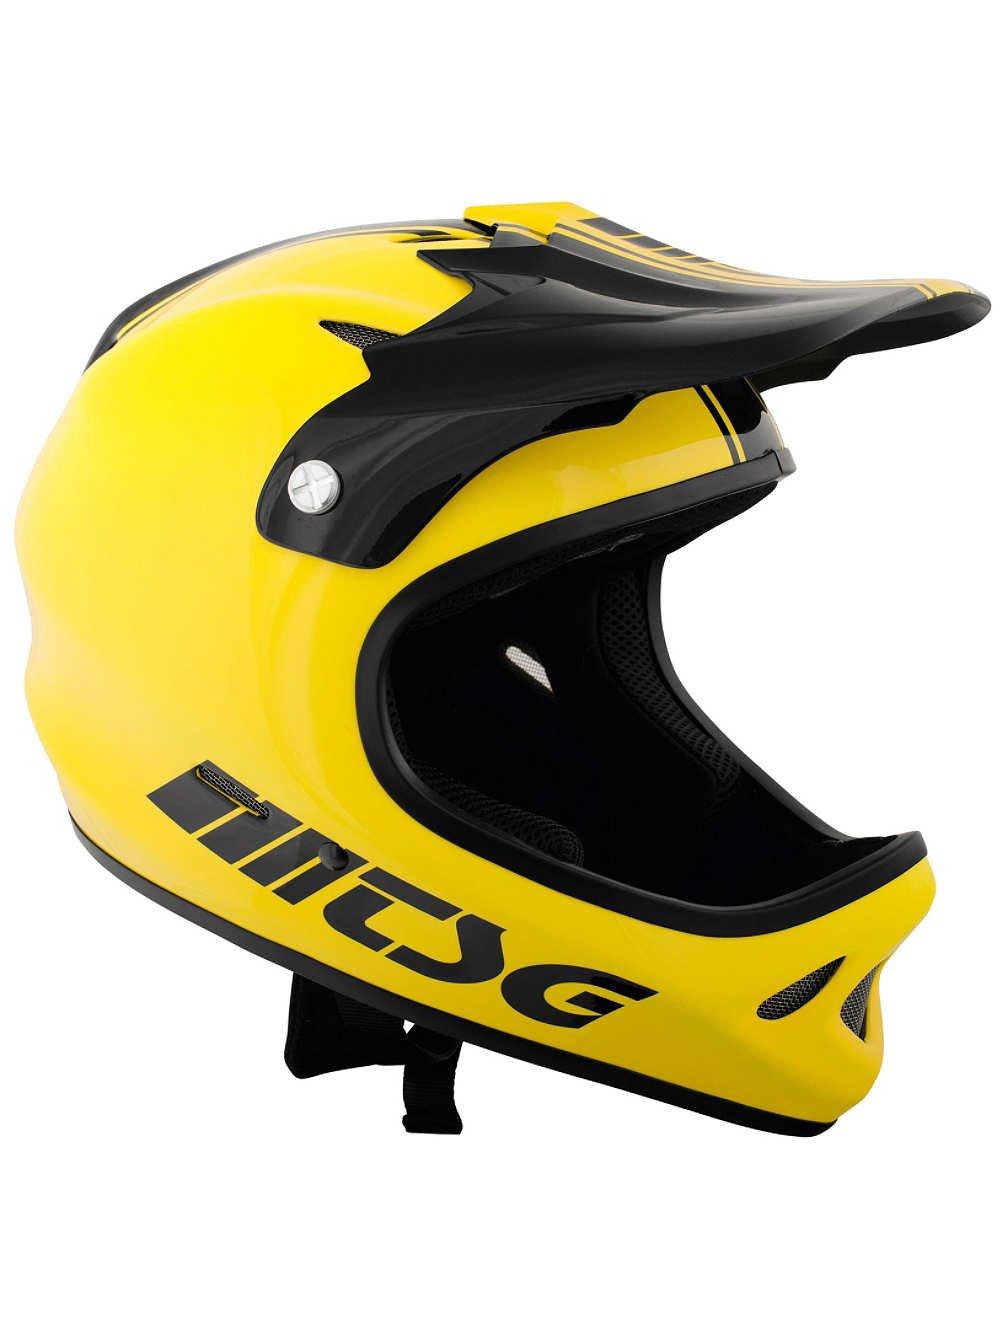 TSG Bike Helm Staten Graphic Design Helmet